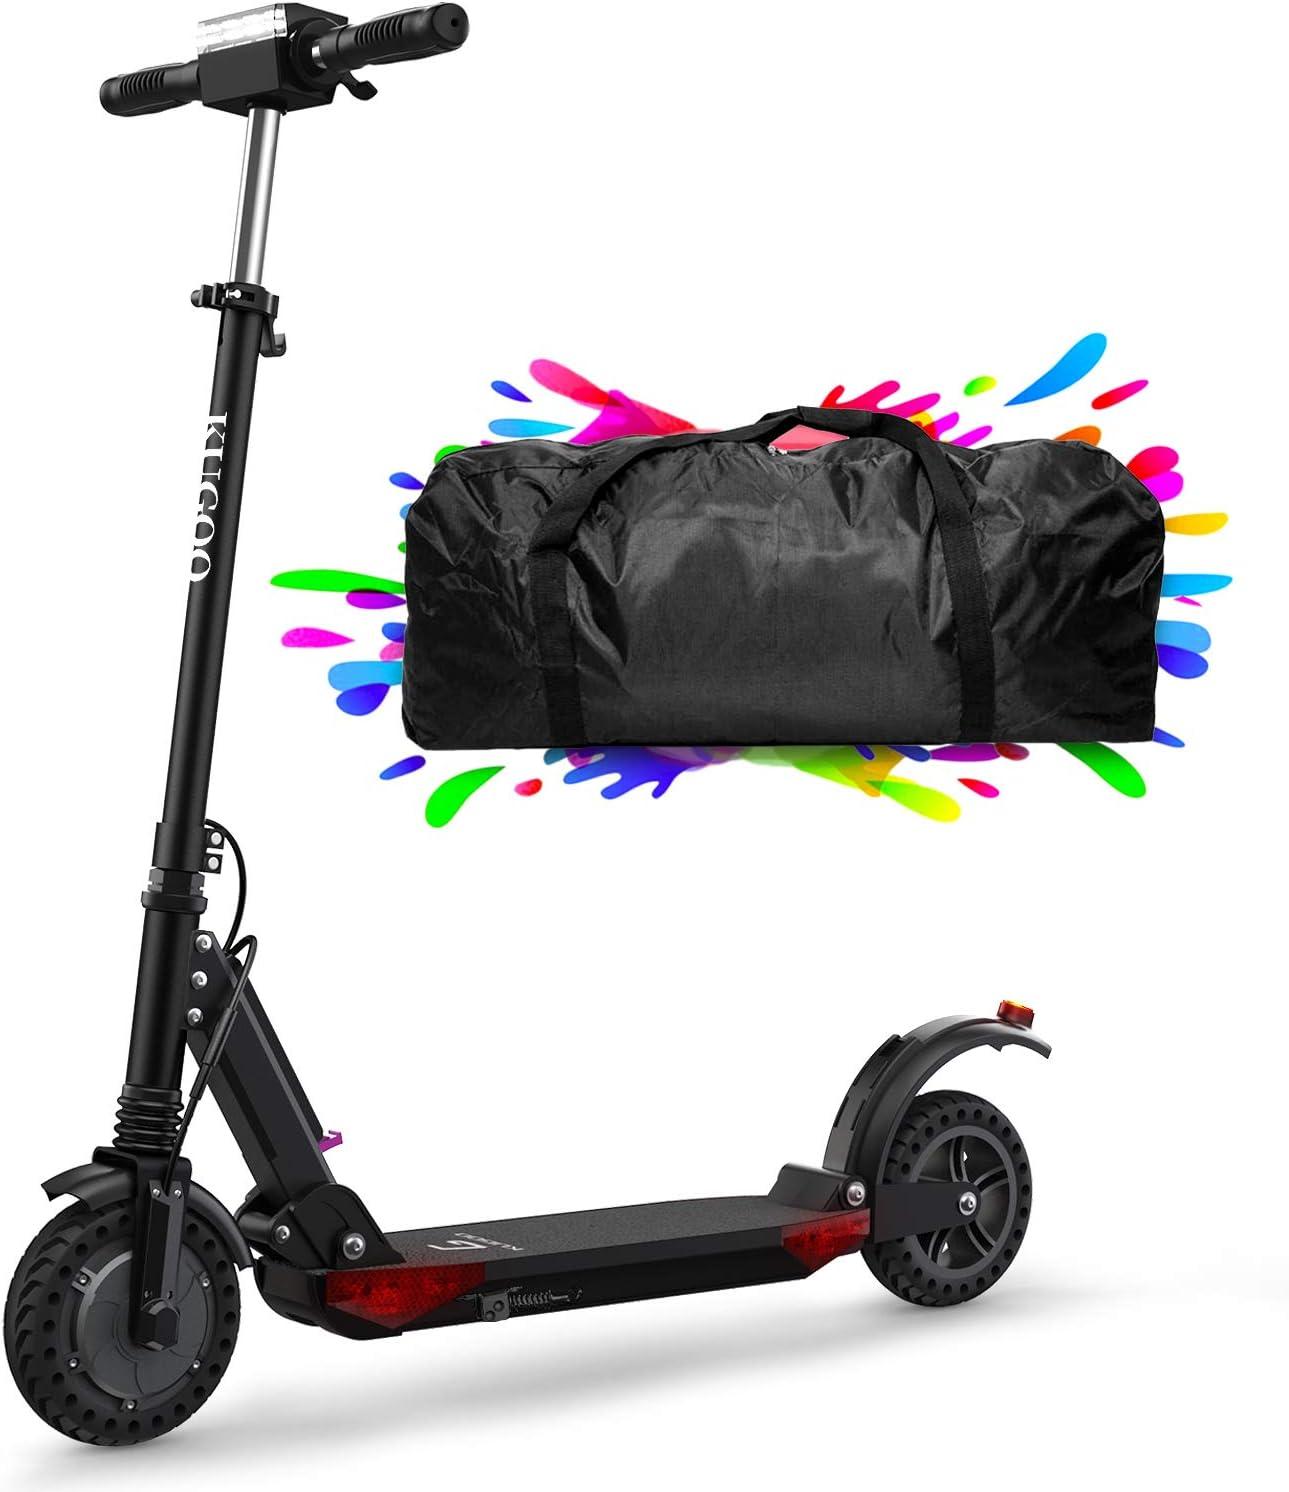 urbetter Patinete Eléctrico Scooter Plegable, 30 Km Alcance, 350W Motor hasta 30km/h, Manillar Ajustable Scooter Electrico para Adultos Unisex y Adolescentes - S1 Pro